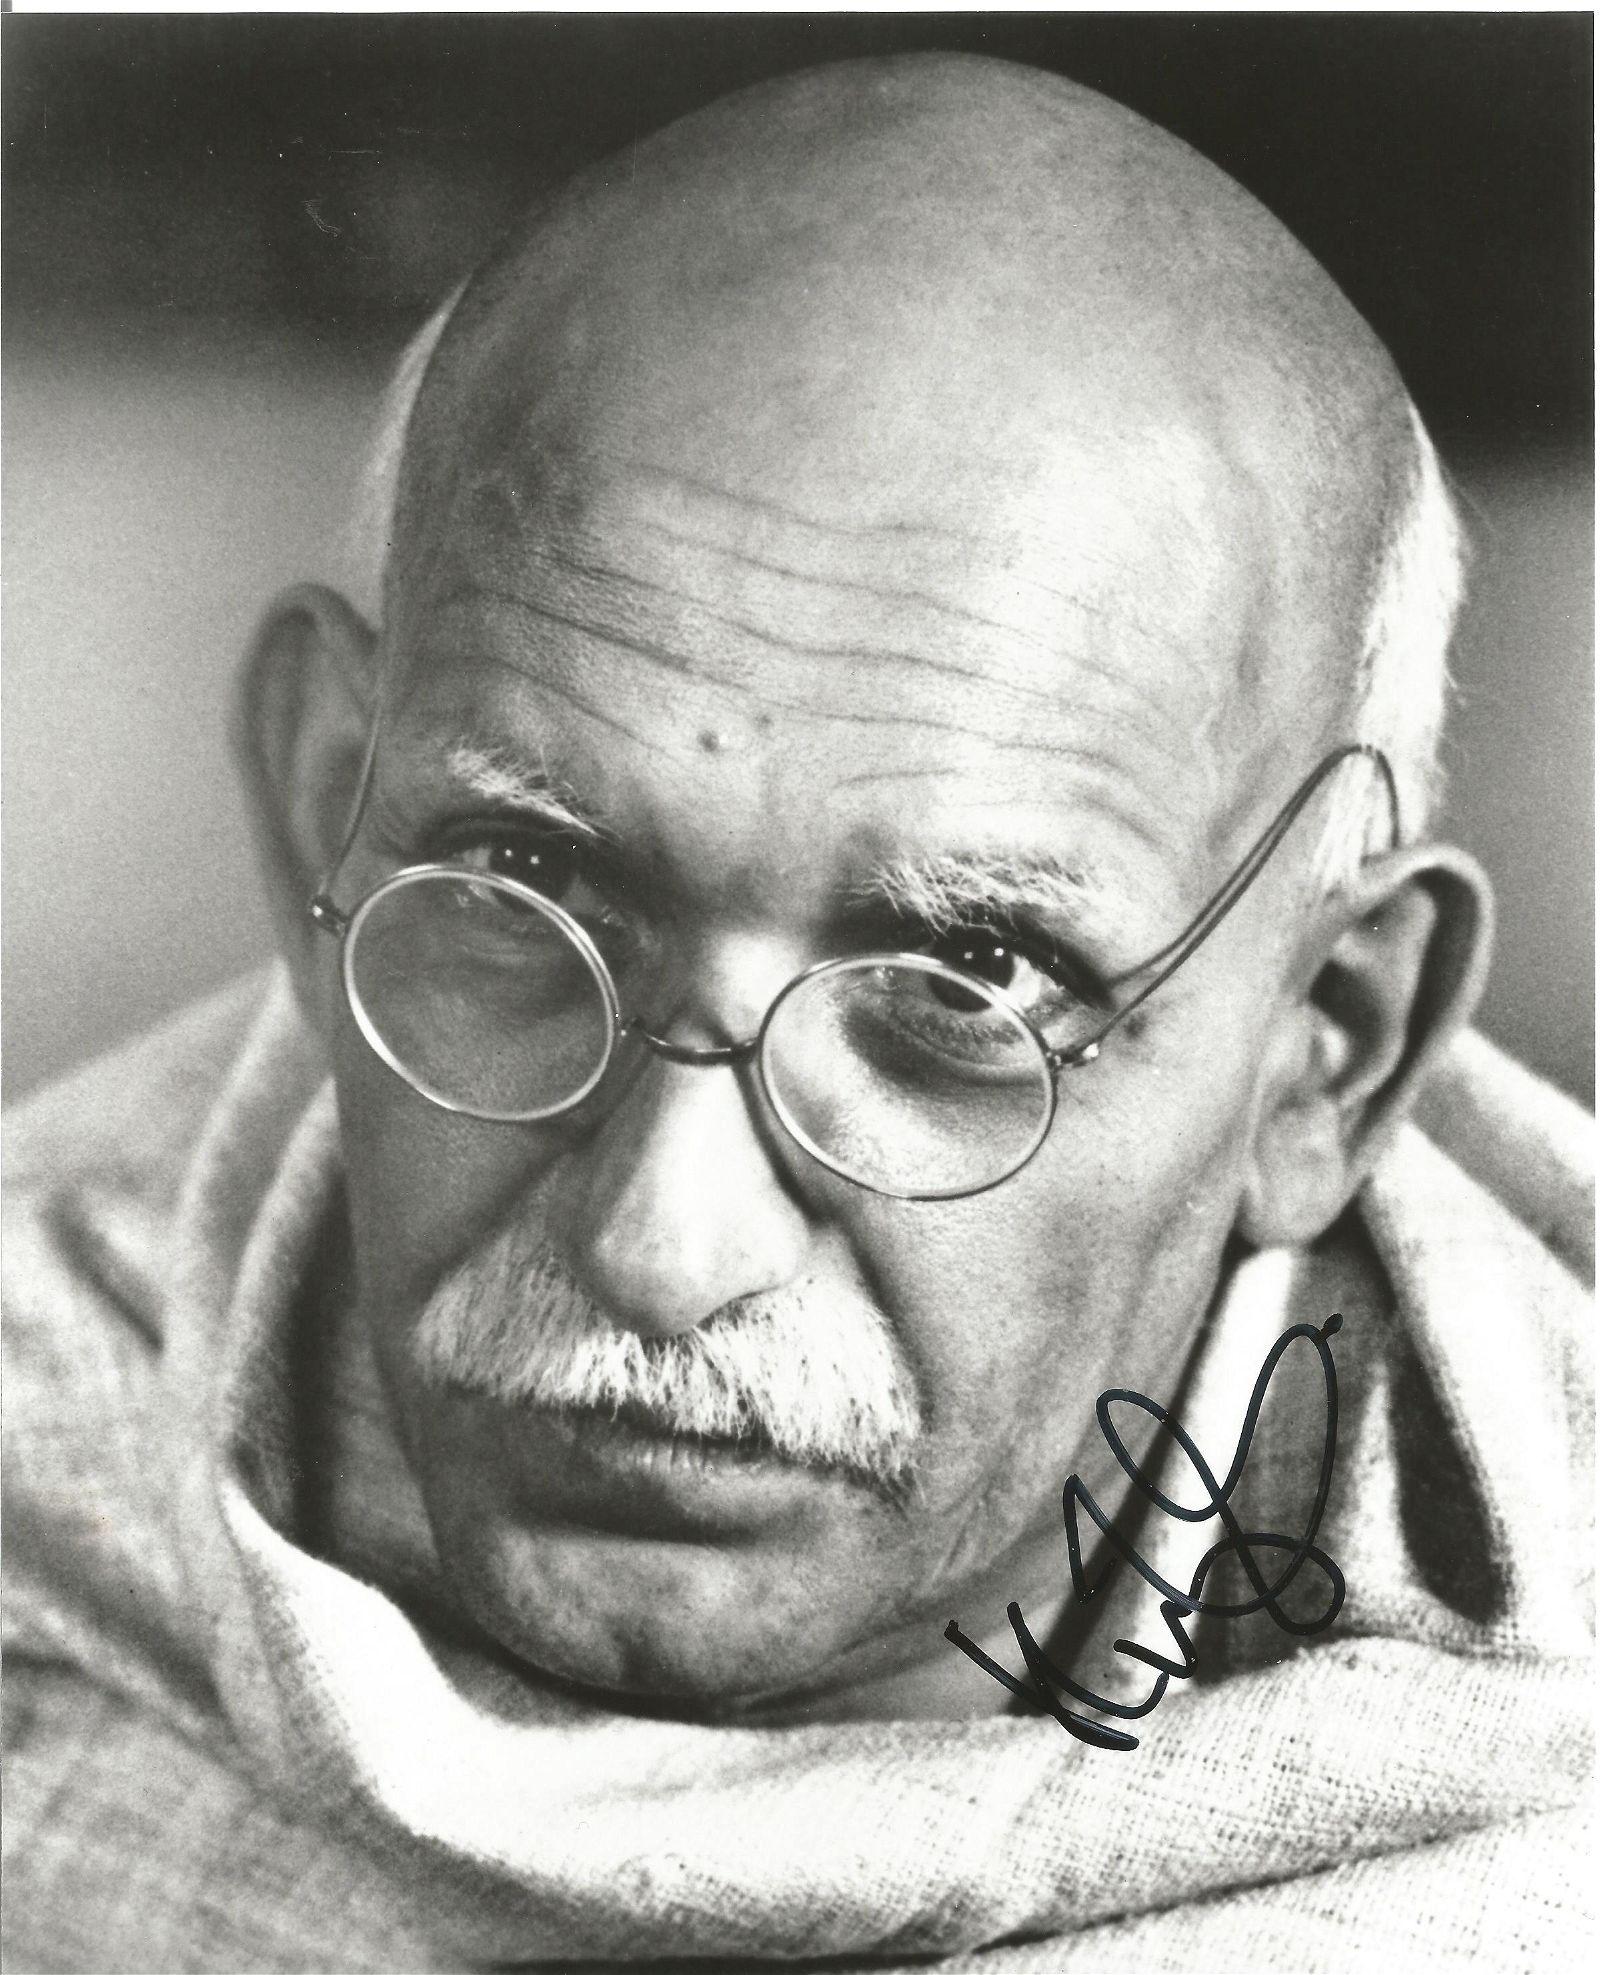 Ben Kingsley as Ghandi signed 10 x 8 inch b/w photo.